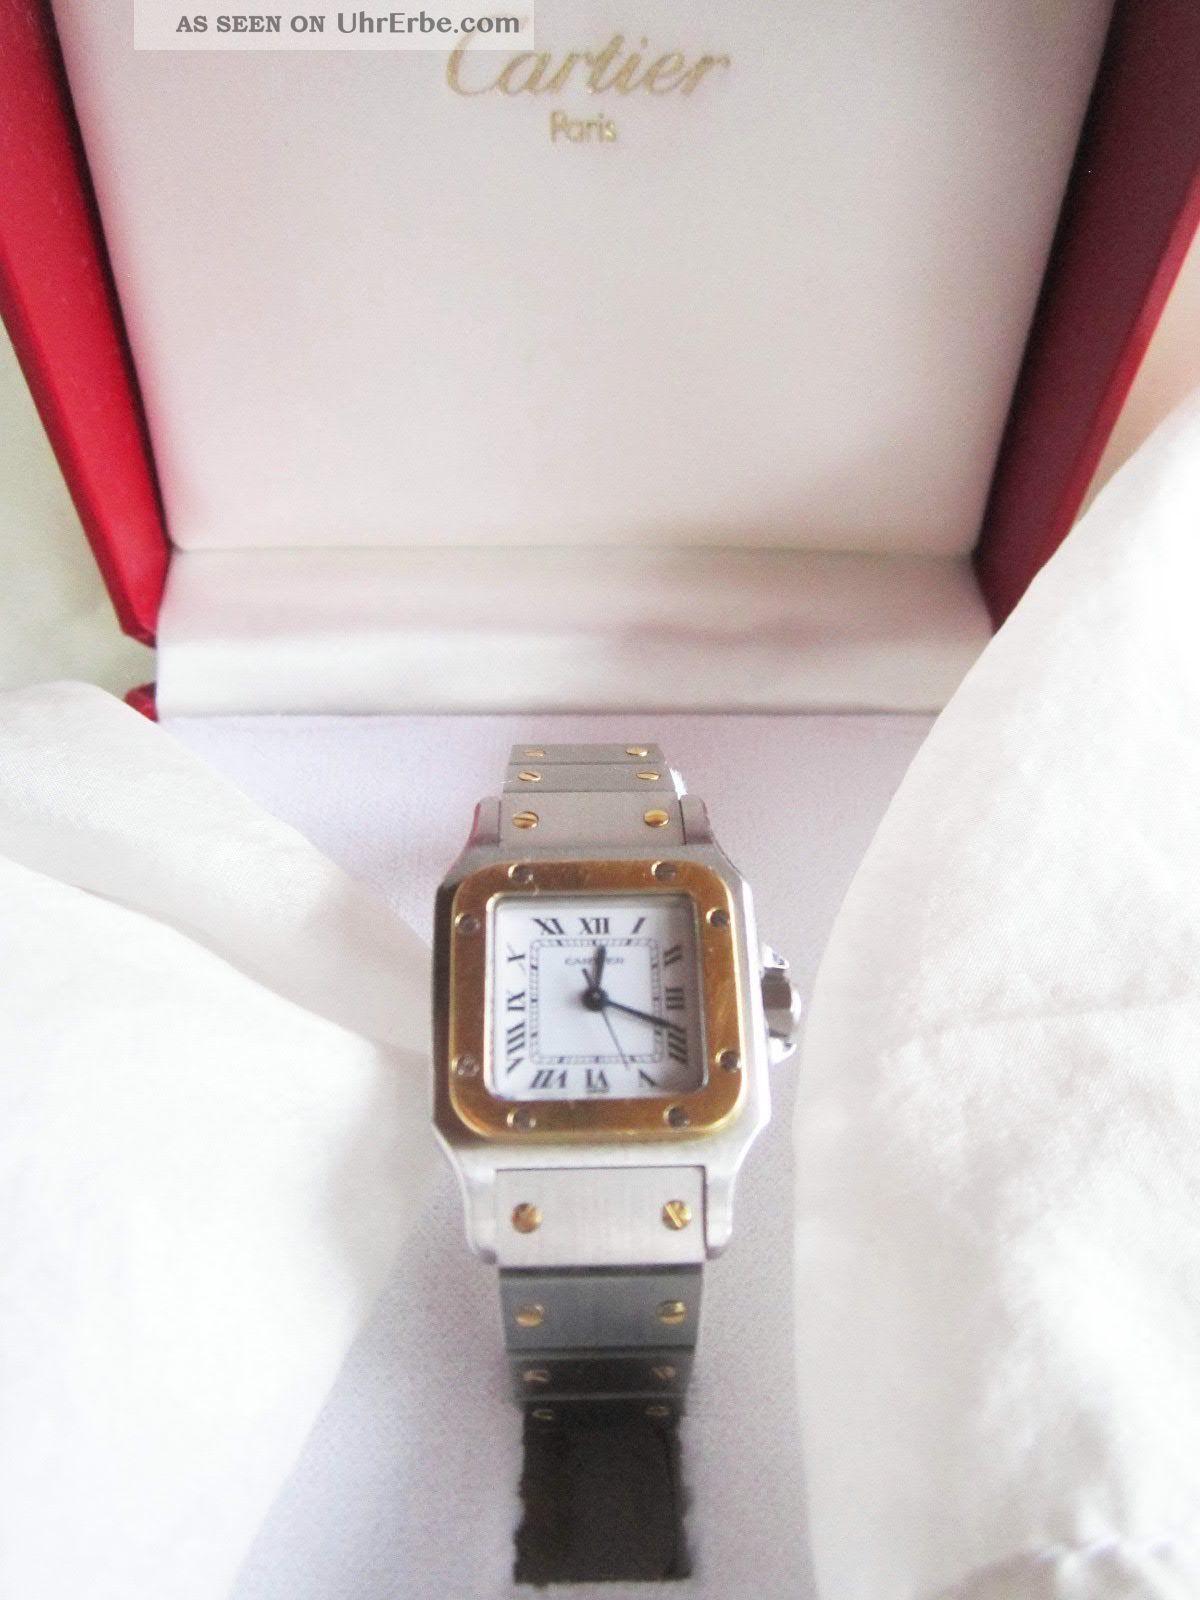 Cartier Damen - Uhr Mit - Zertifikat Modell Santos Automatik Armbanduhren Bild